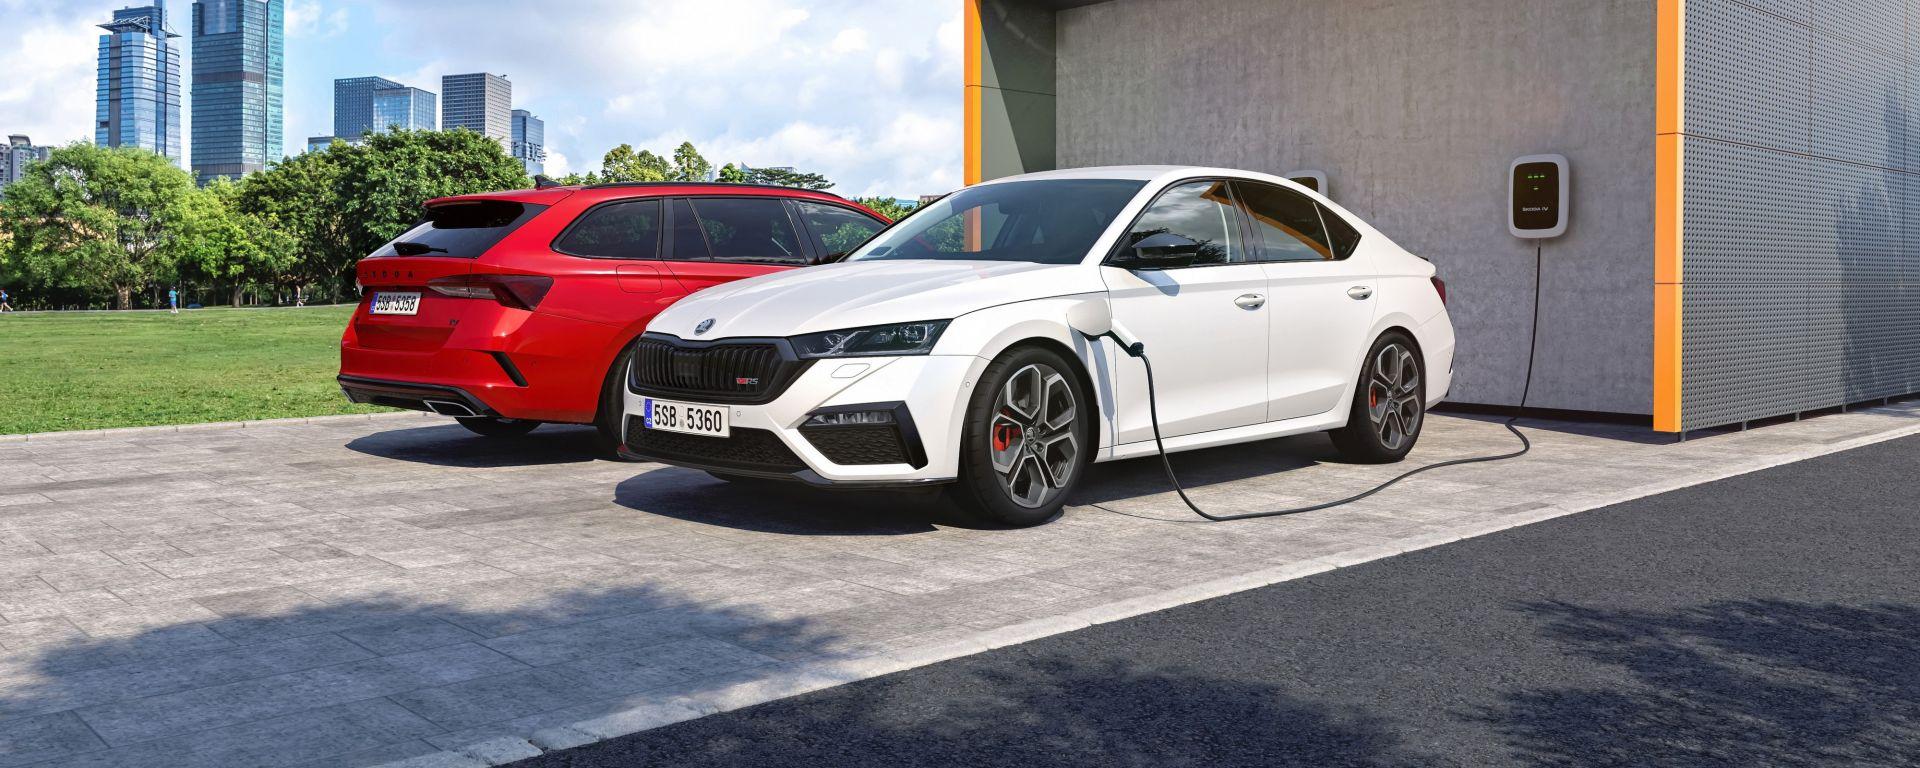 Skoda Octavia RS iV berlina e Wagon: le plug-in hybrid sportive in ricarica